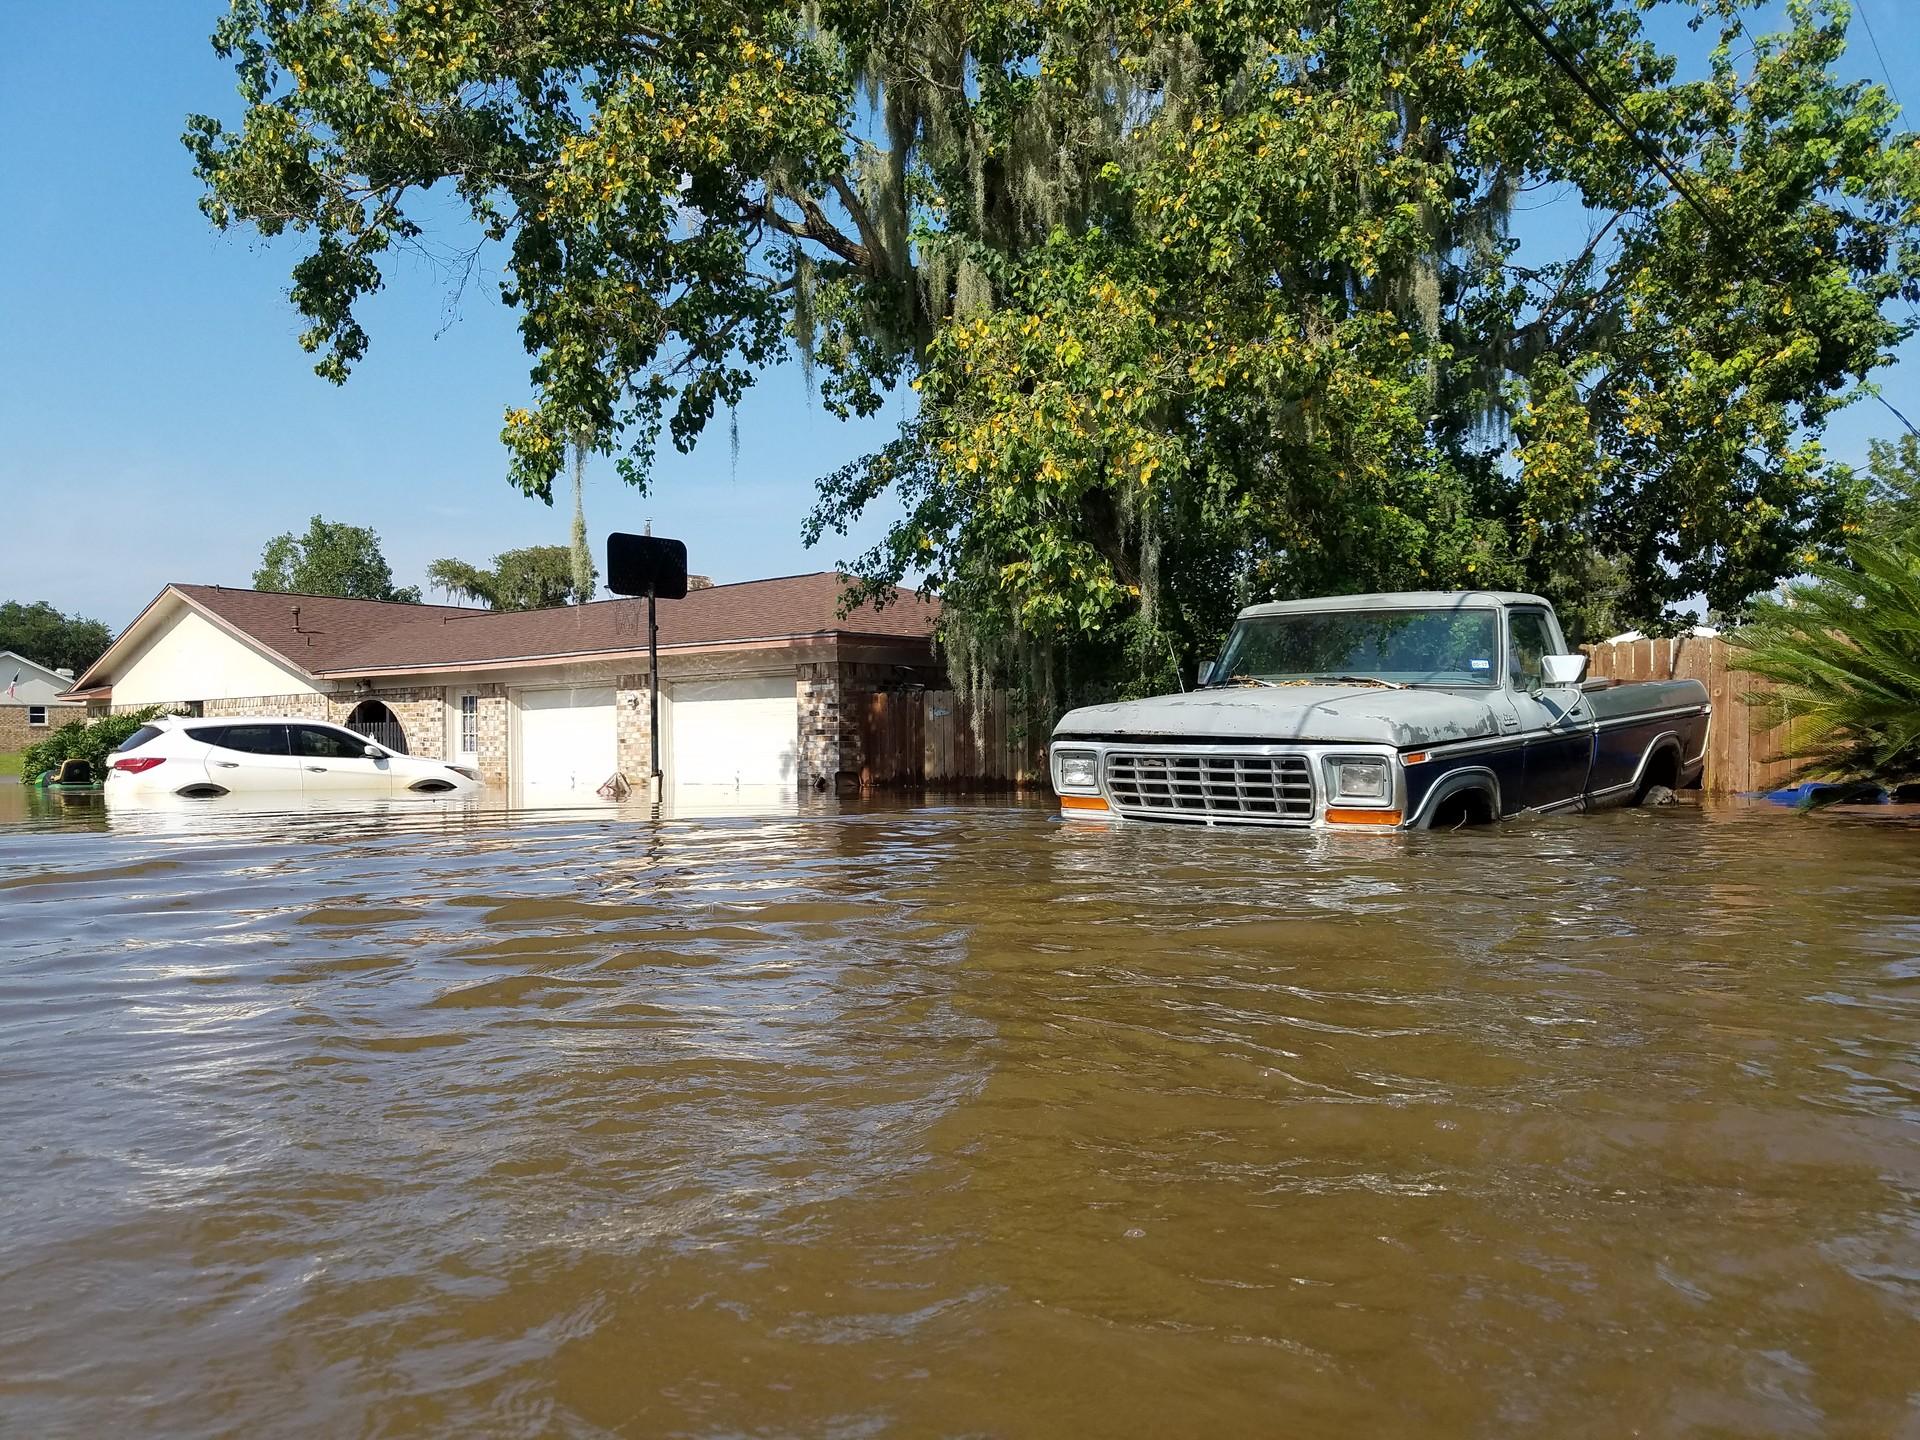 Into the Flood